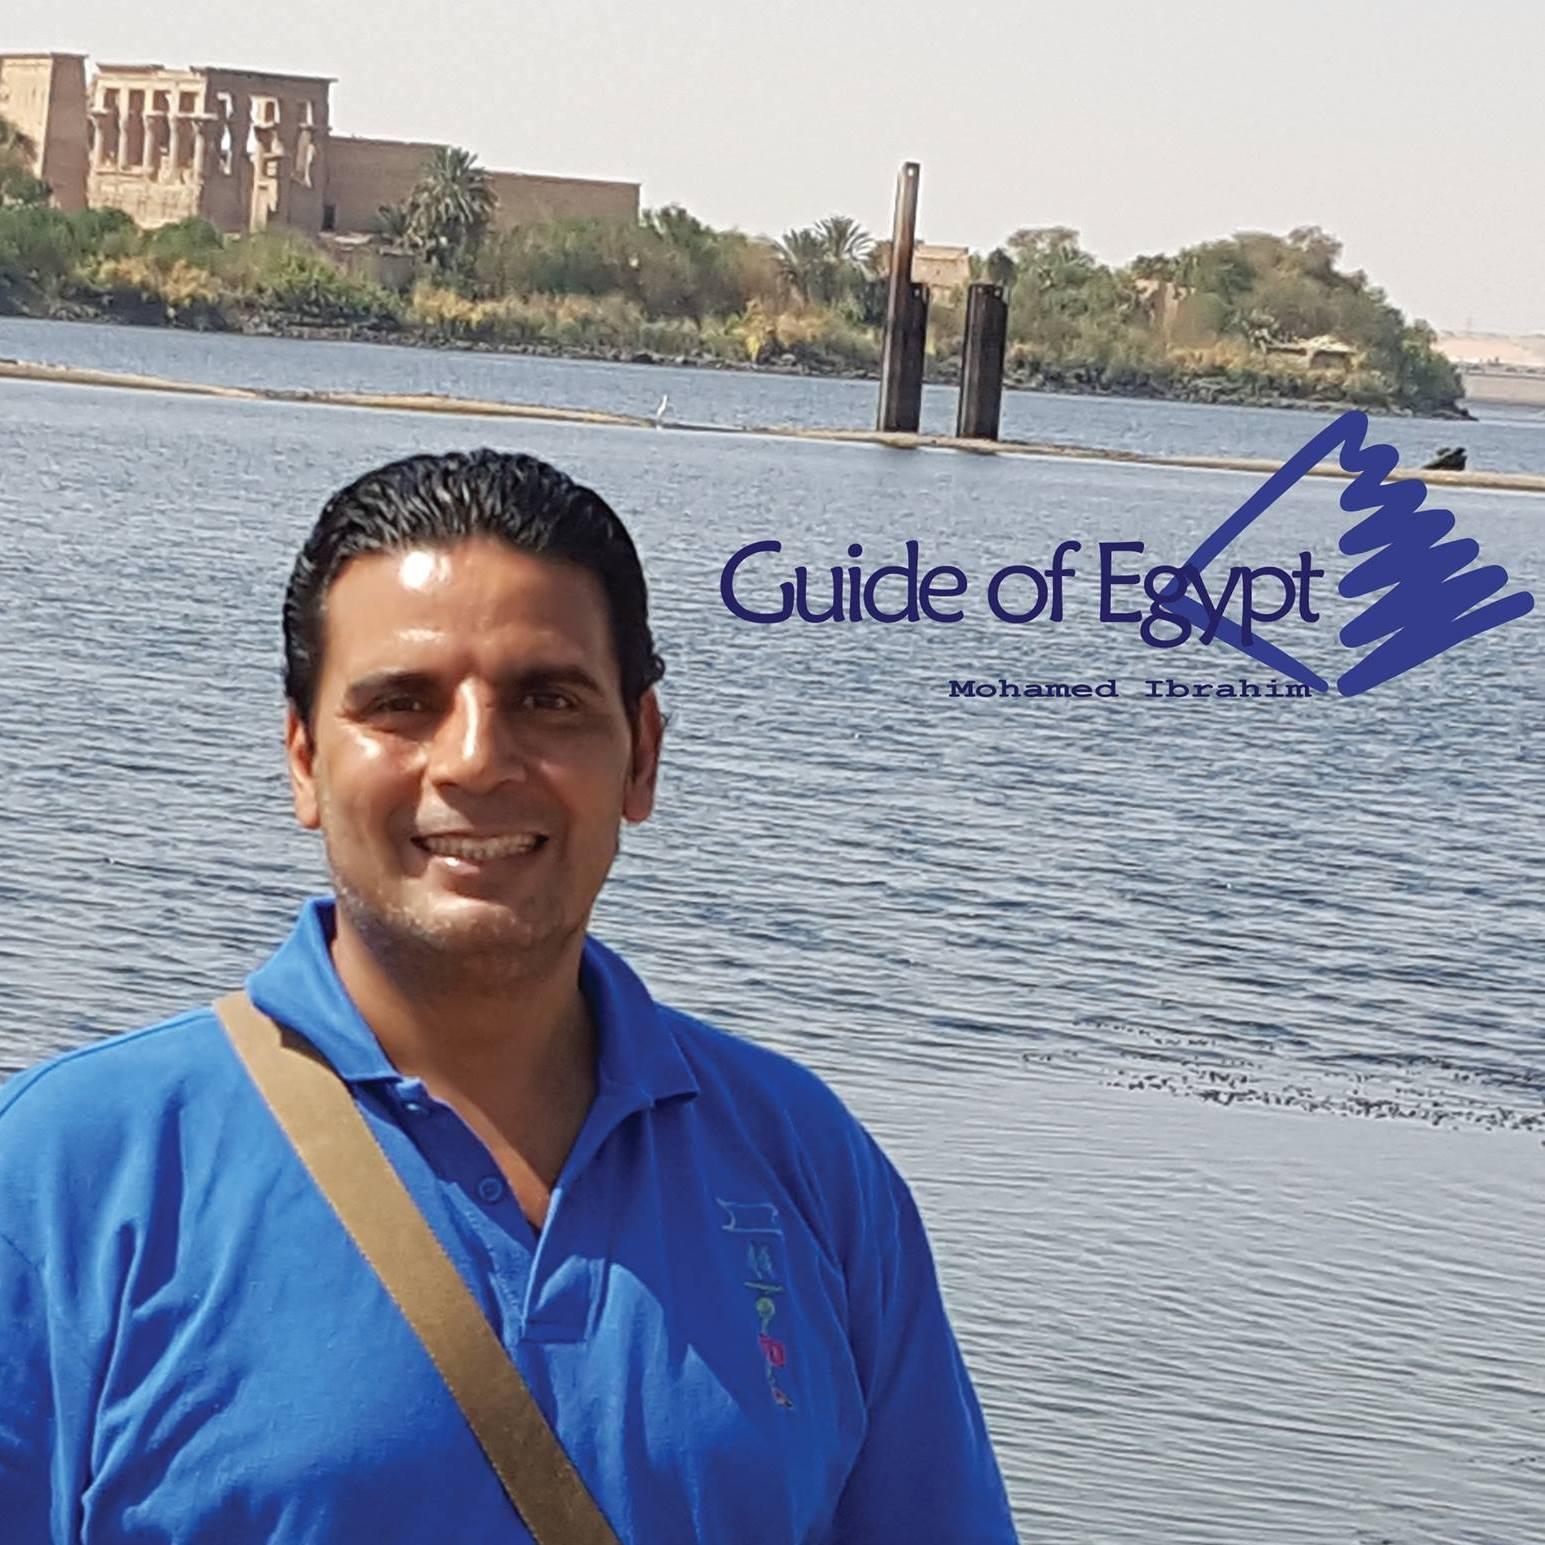 Mohamed Ibrahim - Egyptologist/Khemitologist, Hieroglyphics Expert, Tour Guide, Director